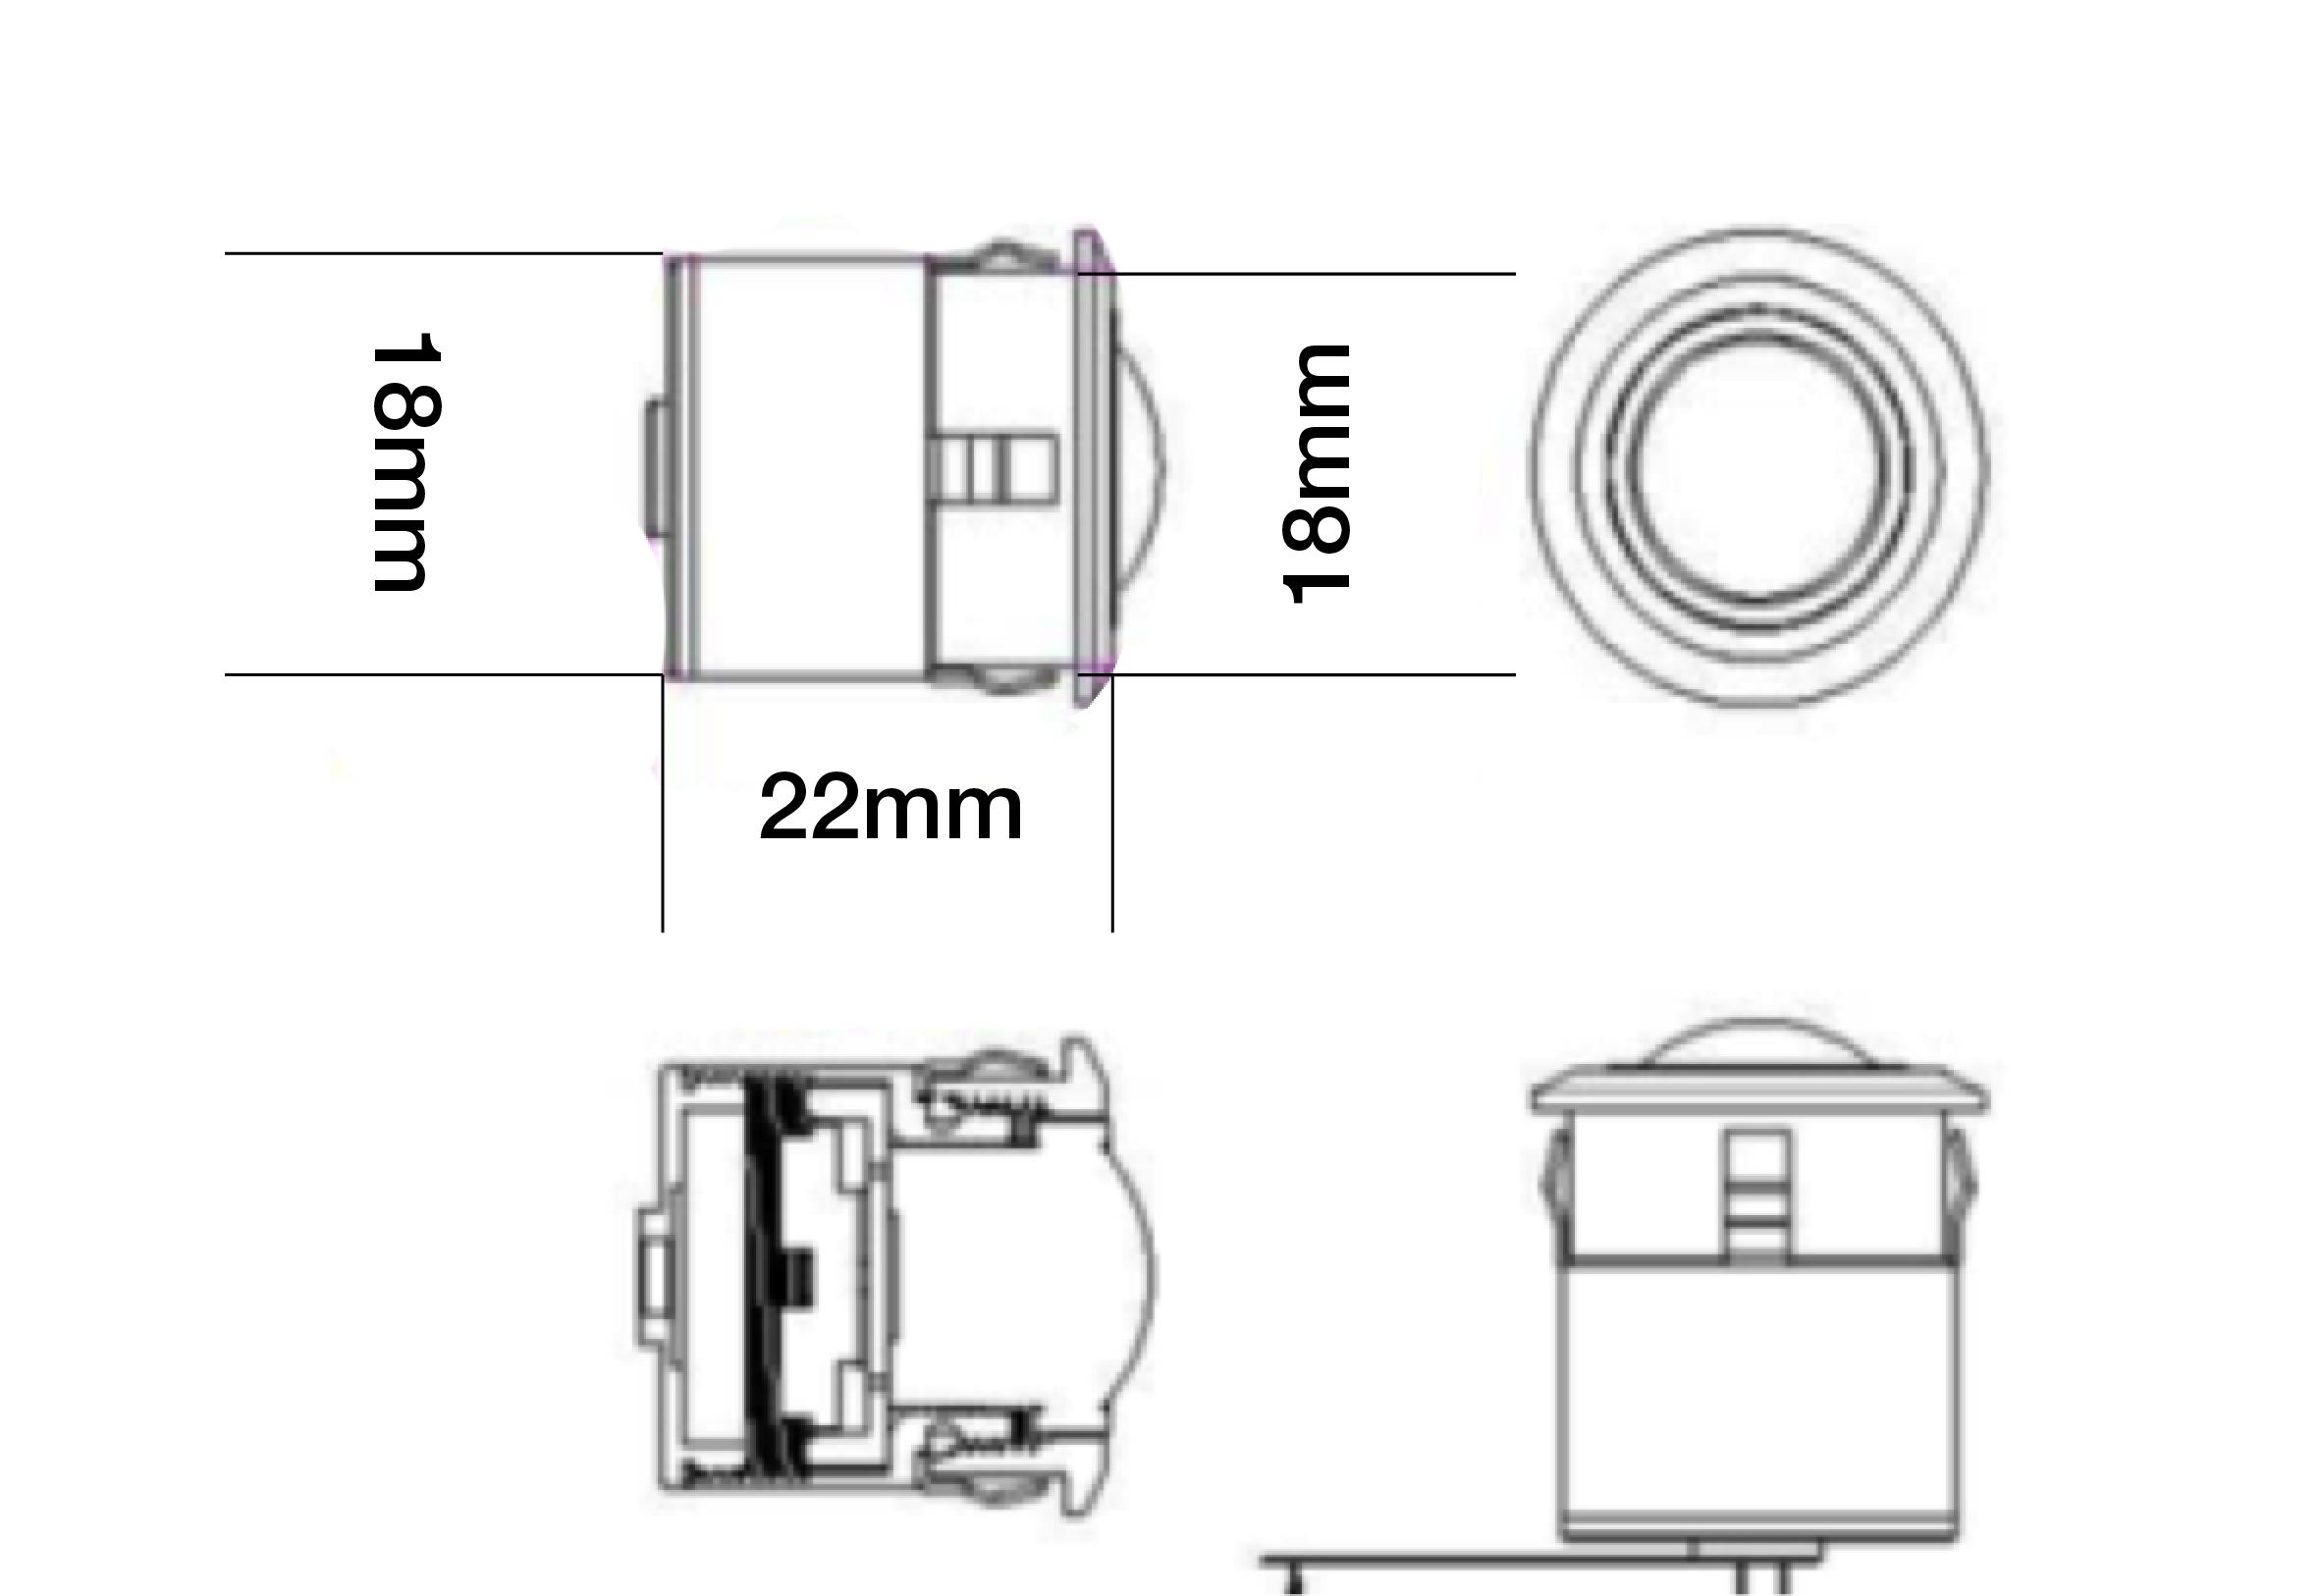 lexus is 250 alternator wiring diagram